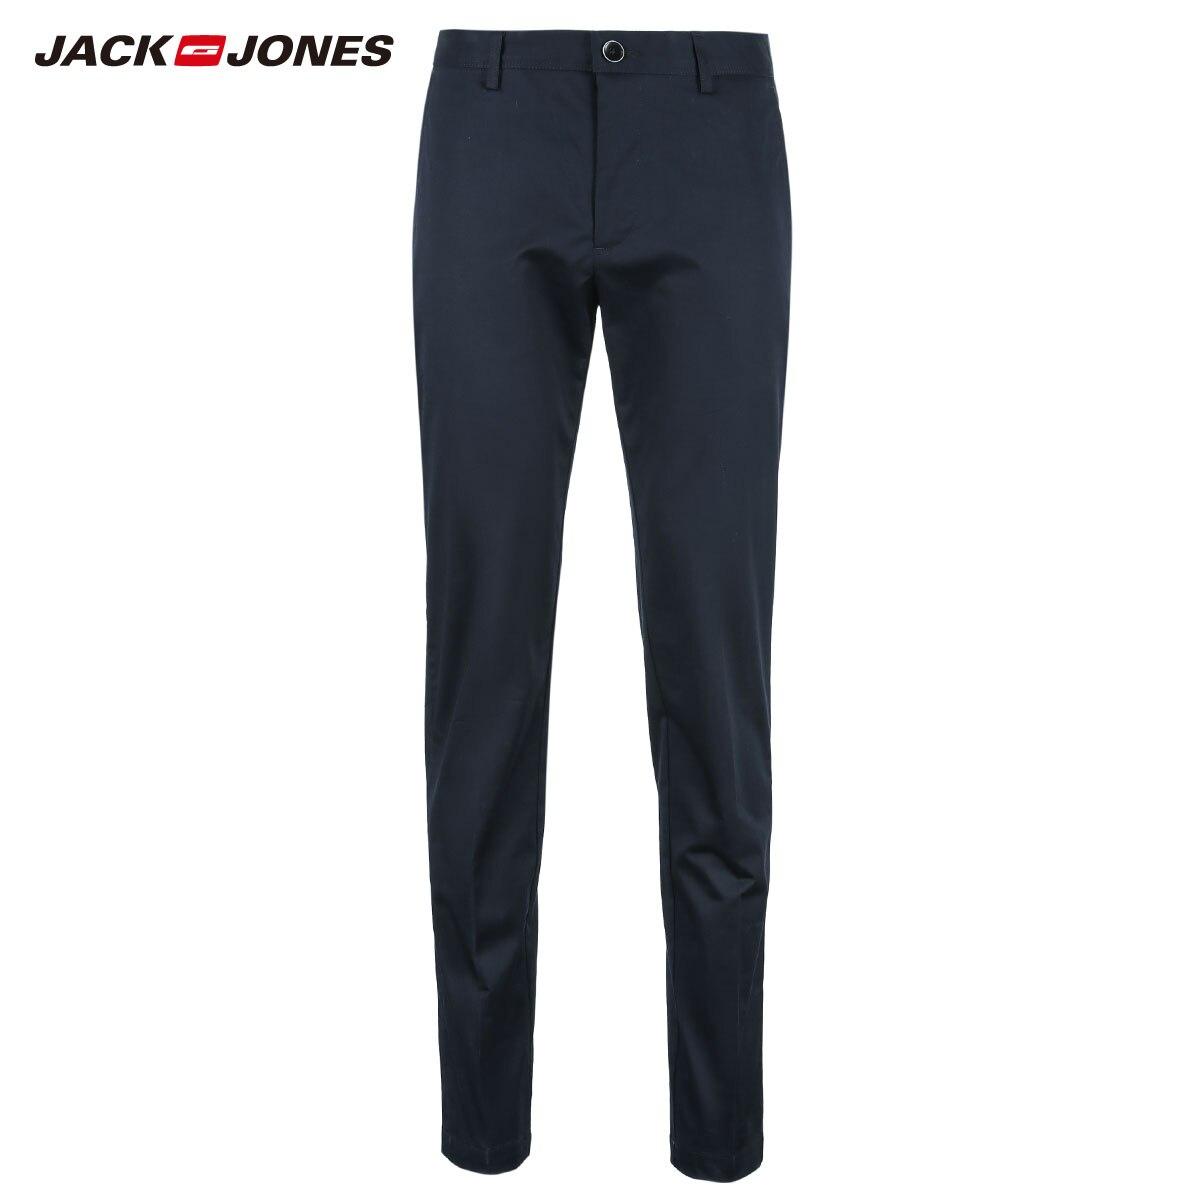 Image 5 - JackJones Mens Cotton Pants Elastic Fabric Comfort Breathable  Business Smart Casual Pants Slim Fit Trousers Menswear218314502Casual  Pants